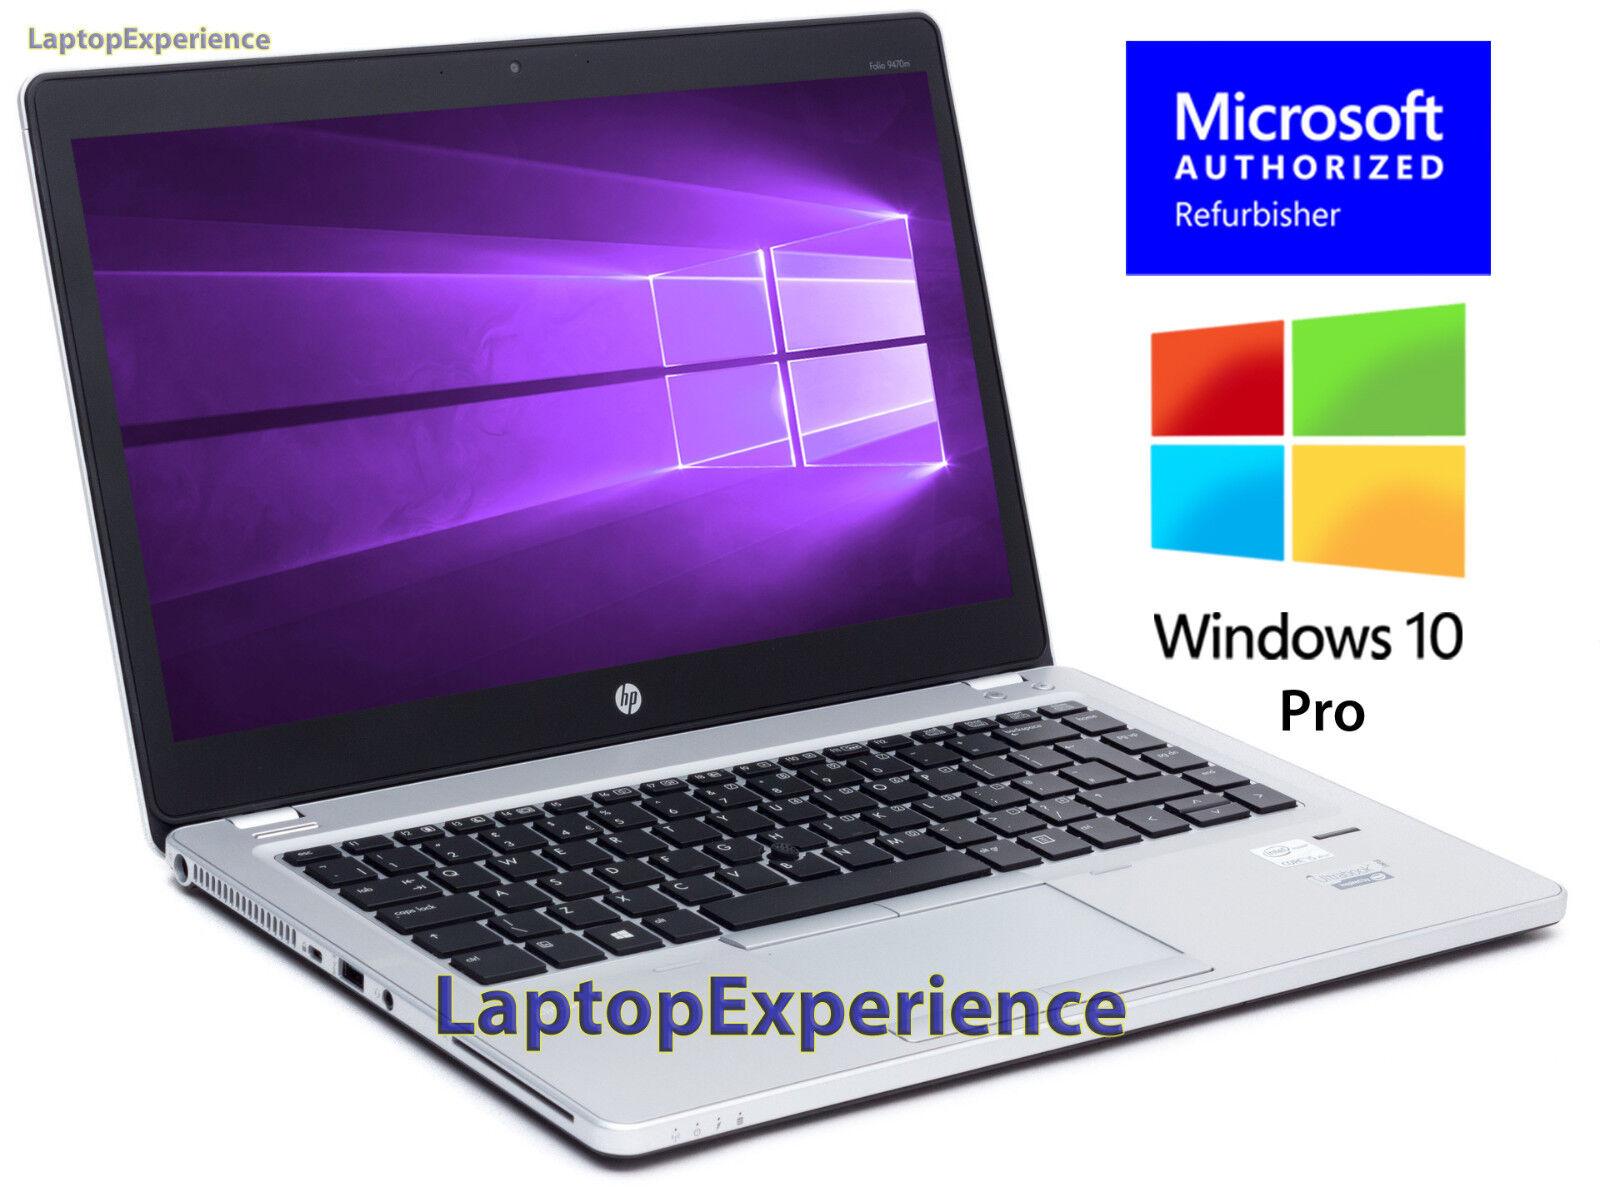 0f448c9d5434c HP LAPTOP 9470m ELITEBOOK FOLIO WINDOWS 10 PRO WIN CORE i5 WEBCAM WiFi  128GB SSD 아이템 넘버  162294295215.